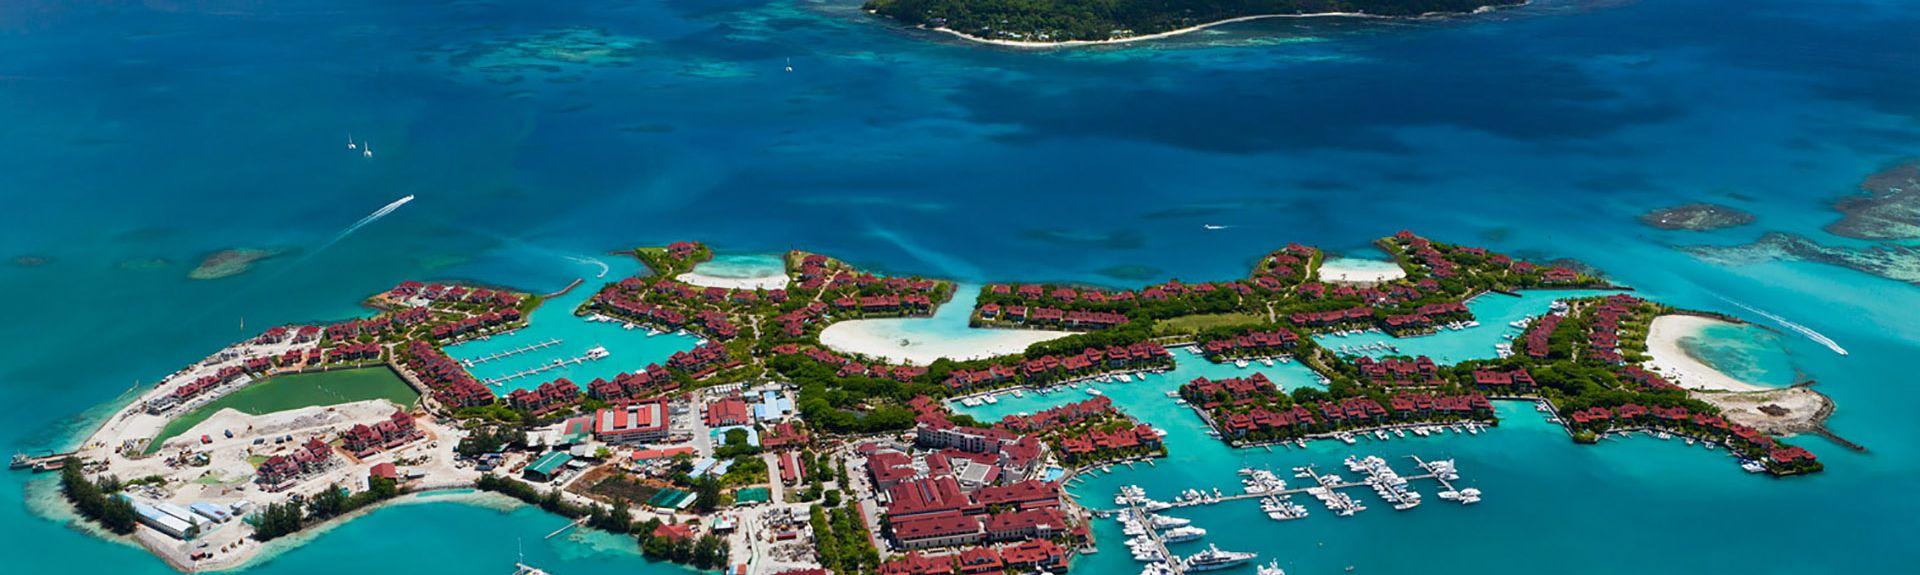 Victoria, Ilhas Seychelles (SEZ-Aeroporto Internacional de Seychelles)